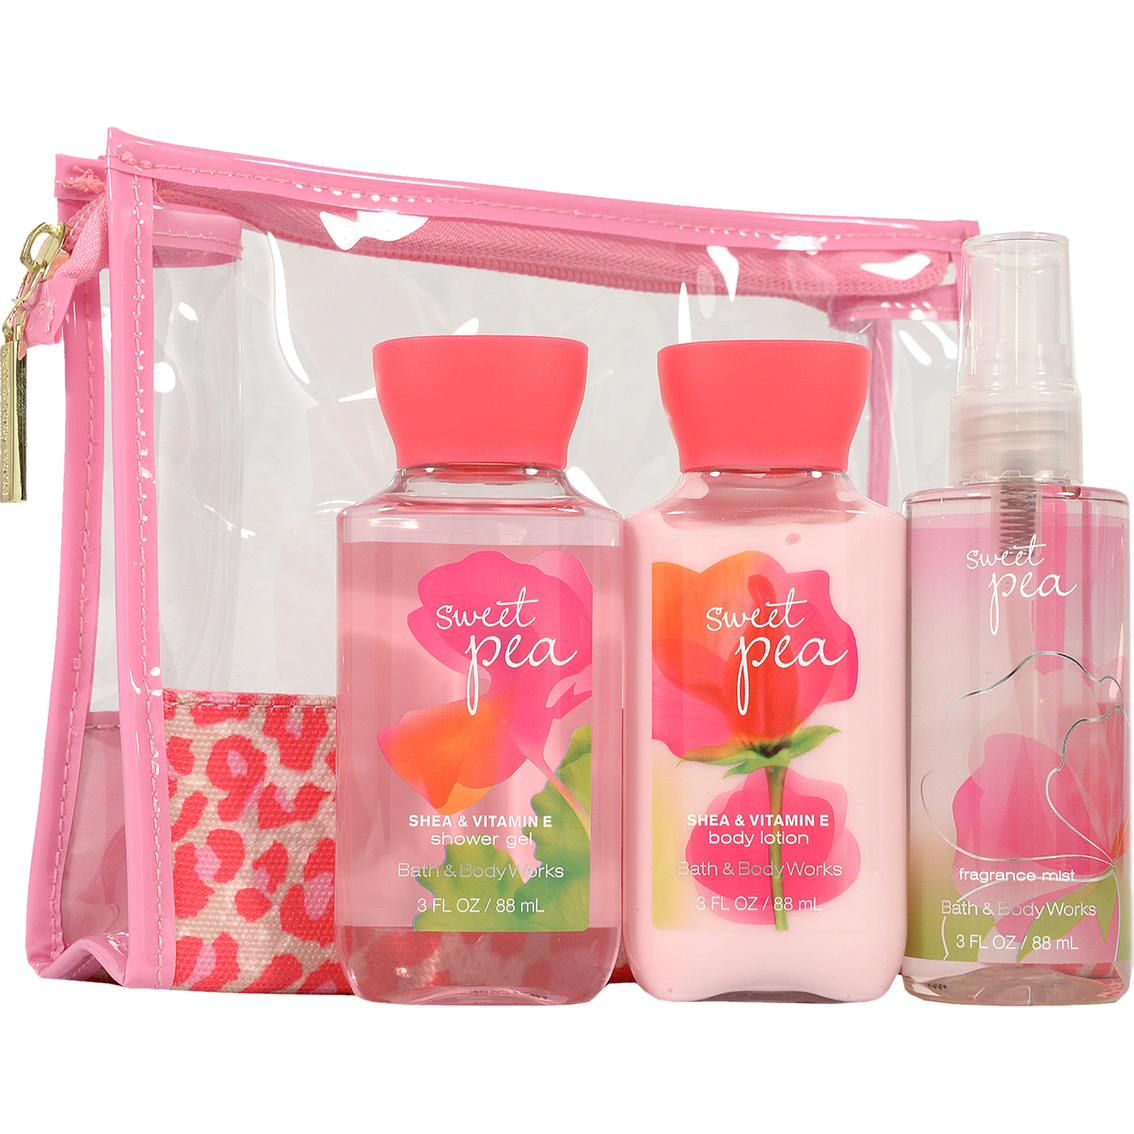 Bath and body works signature mini ritual cosmetic bag